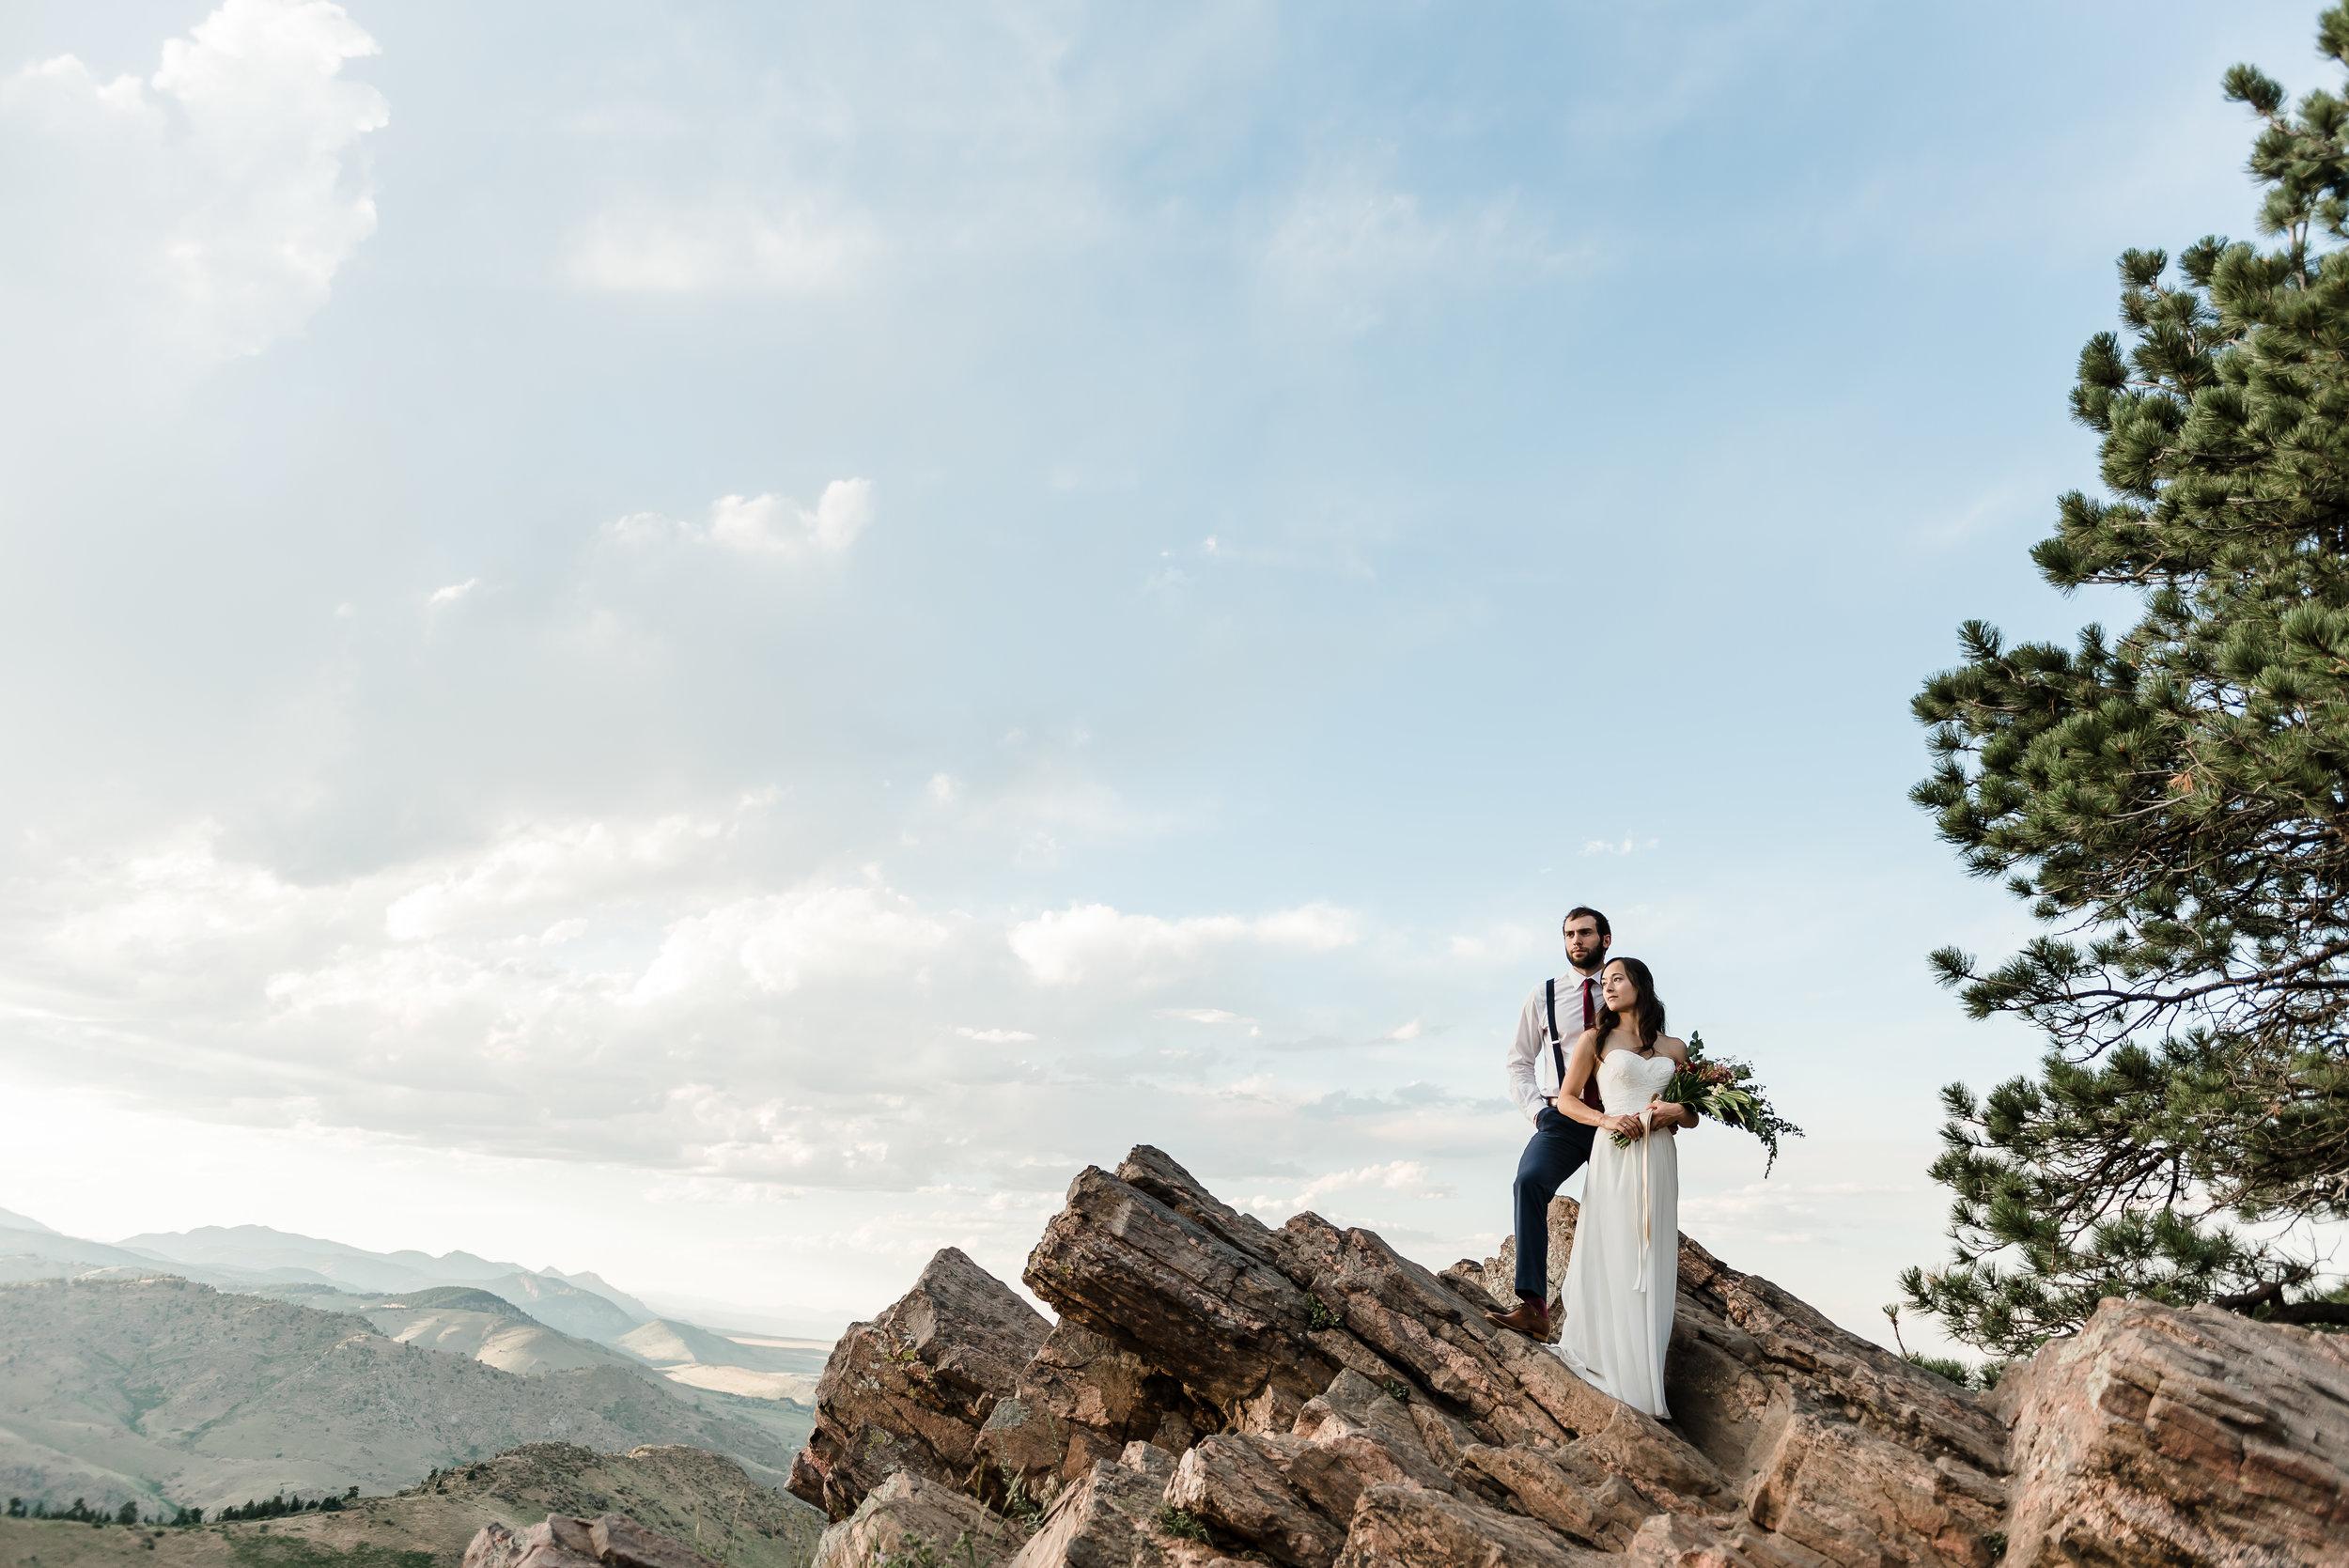 Tashina and Nate - Newlyweds-47.jpg